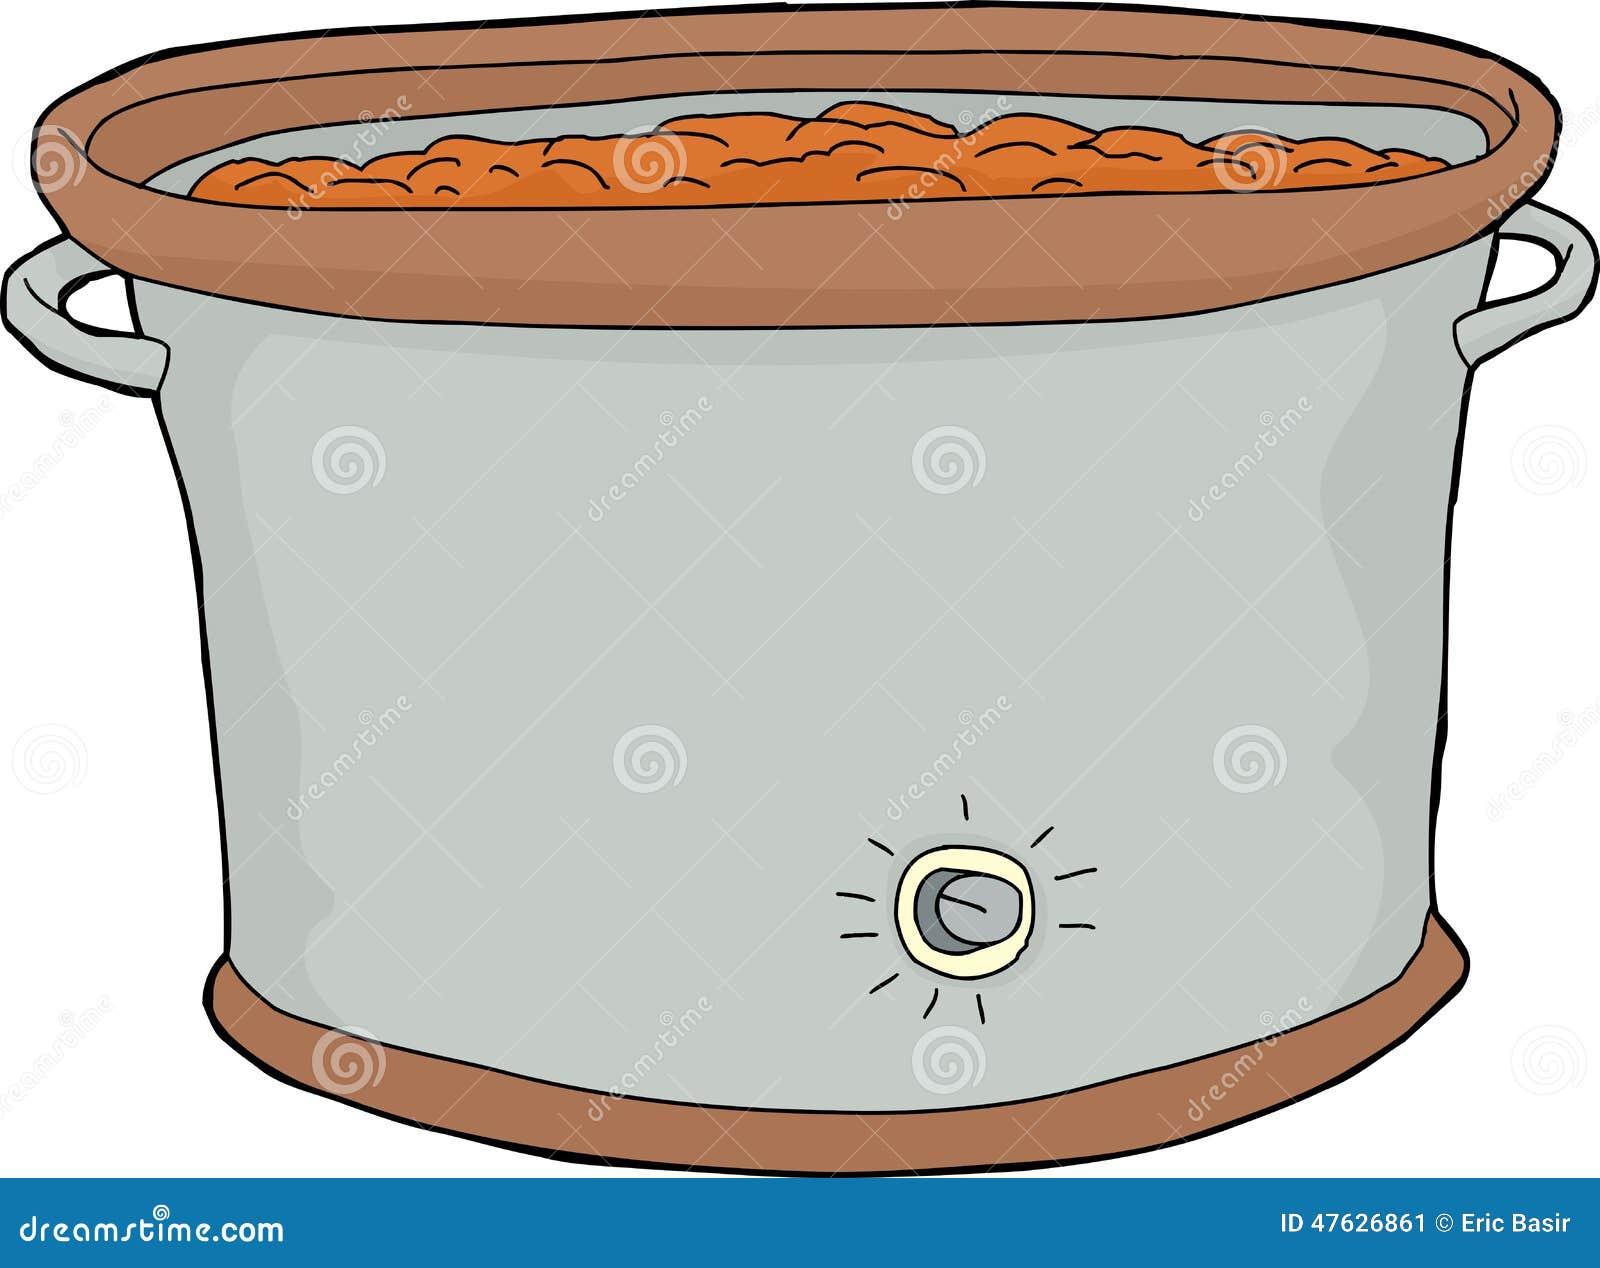 Cartoon Electric Cooker ~ Crock pot with food stock vector image